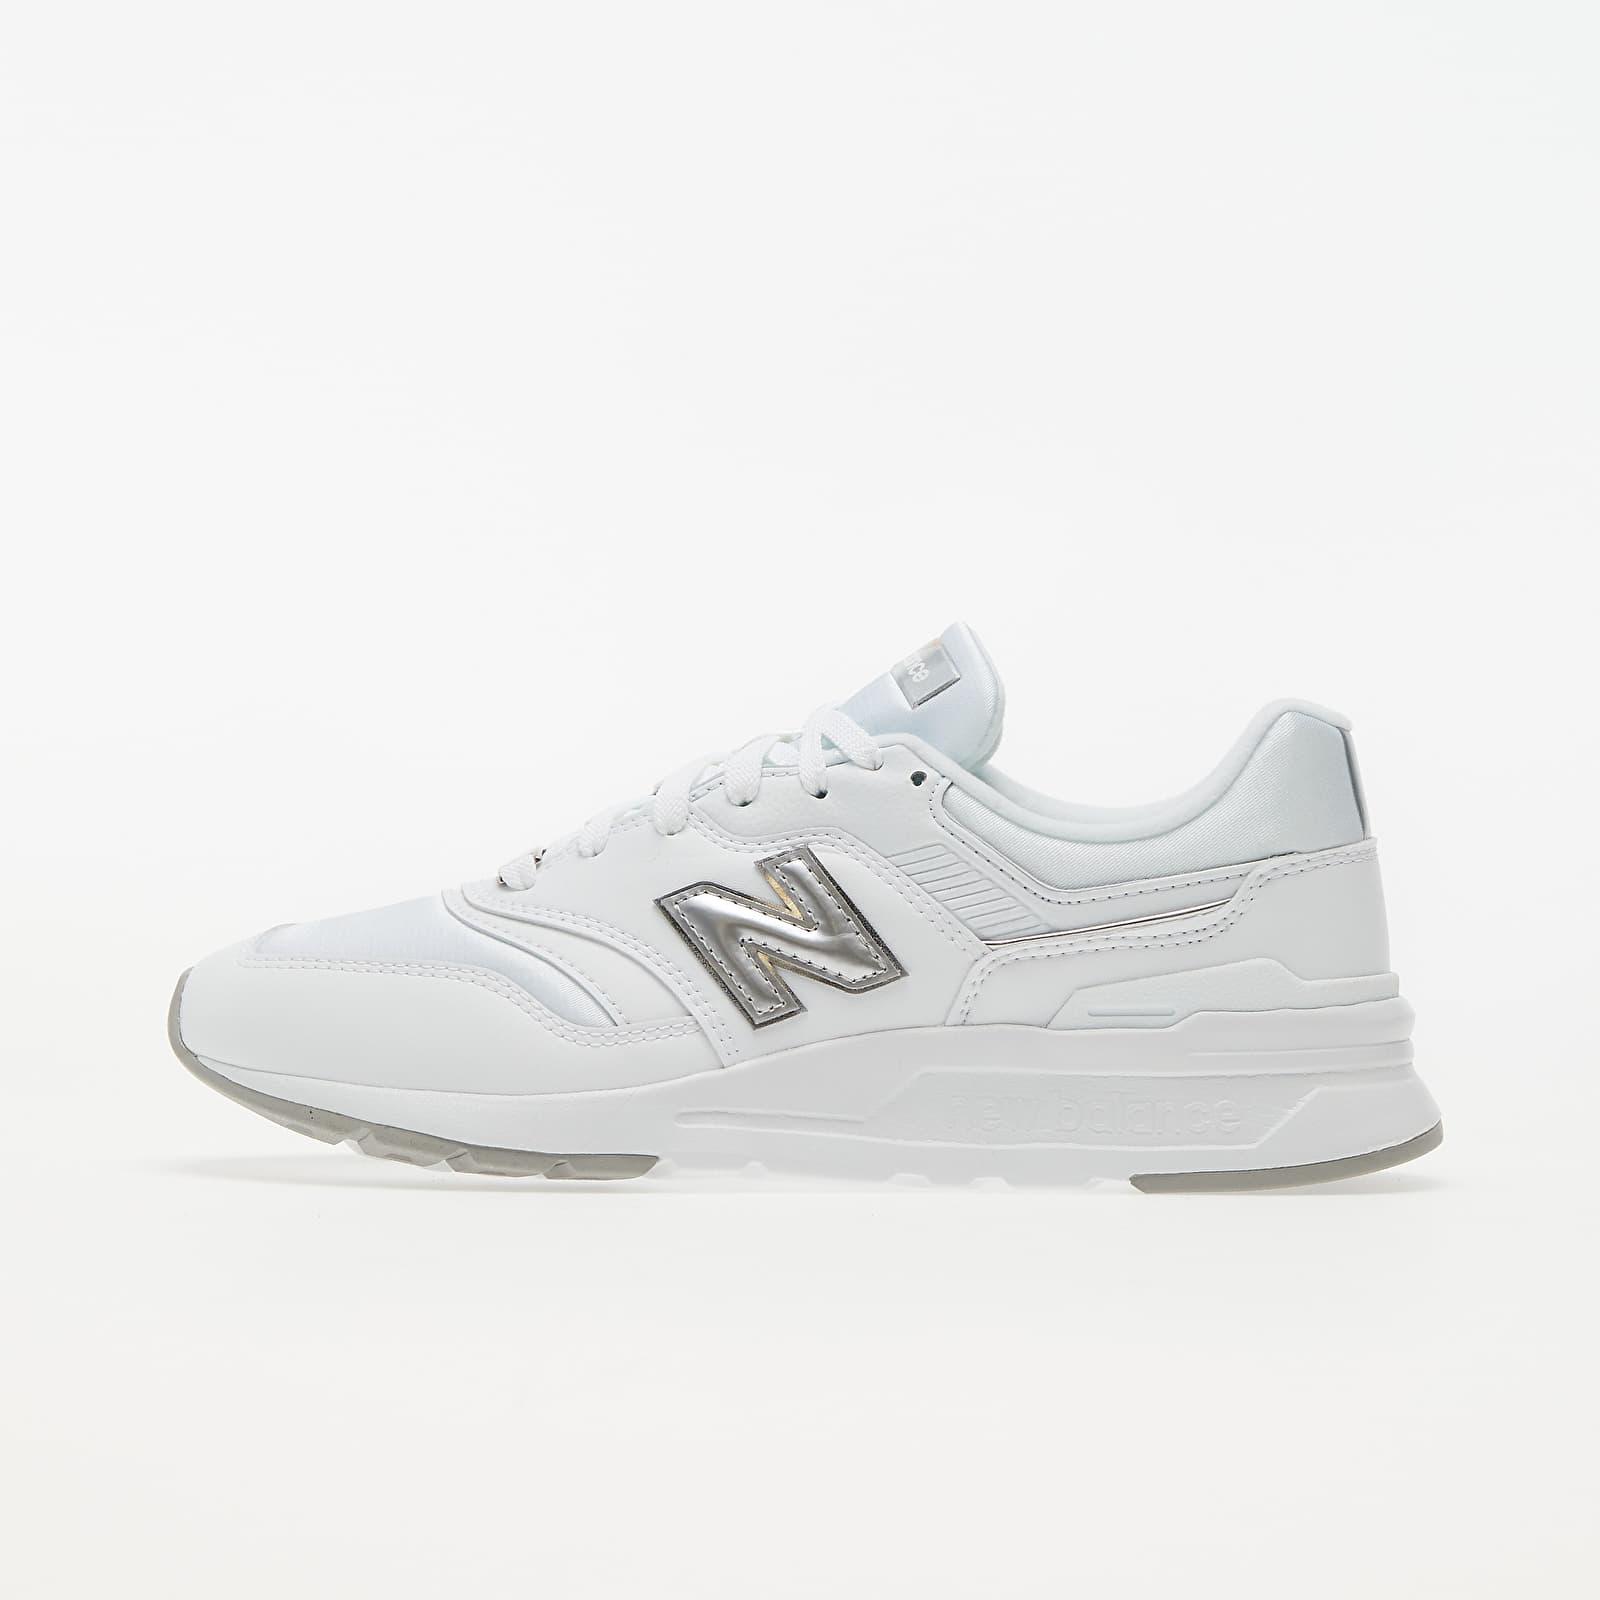 New Balance 997 White/ Silver EUR 36.5